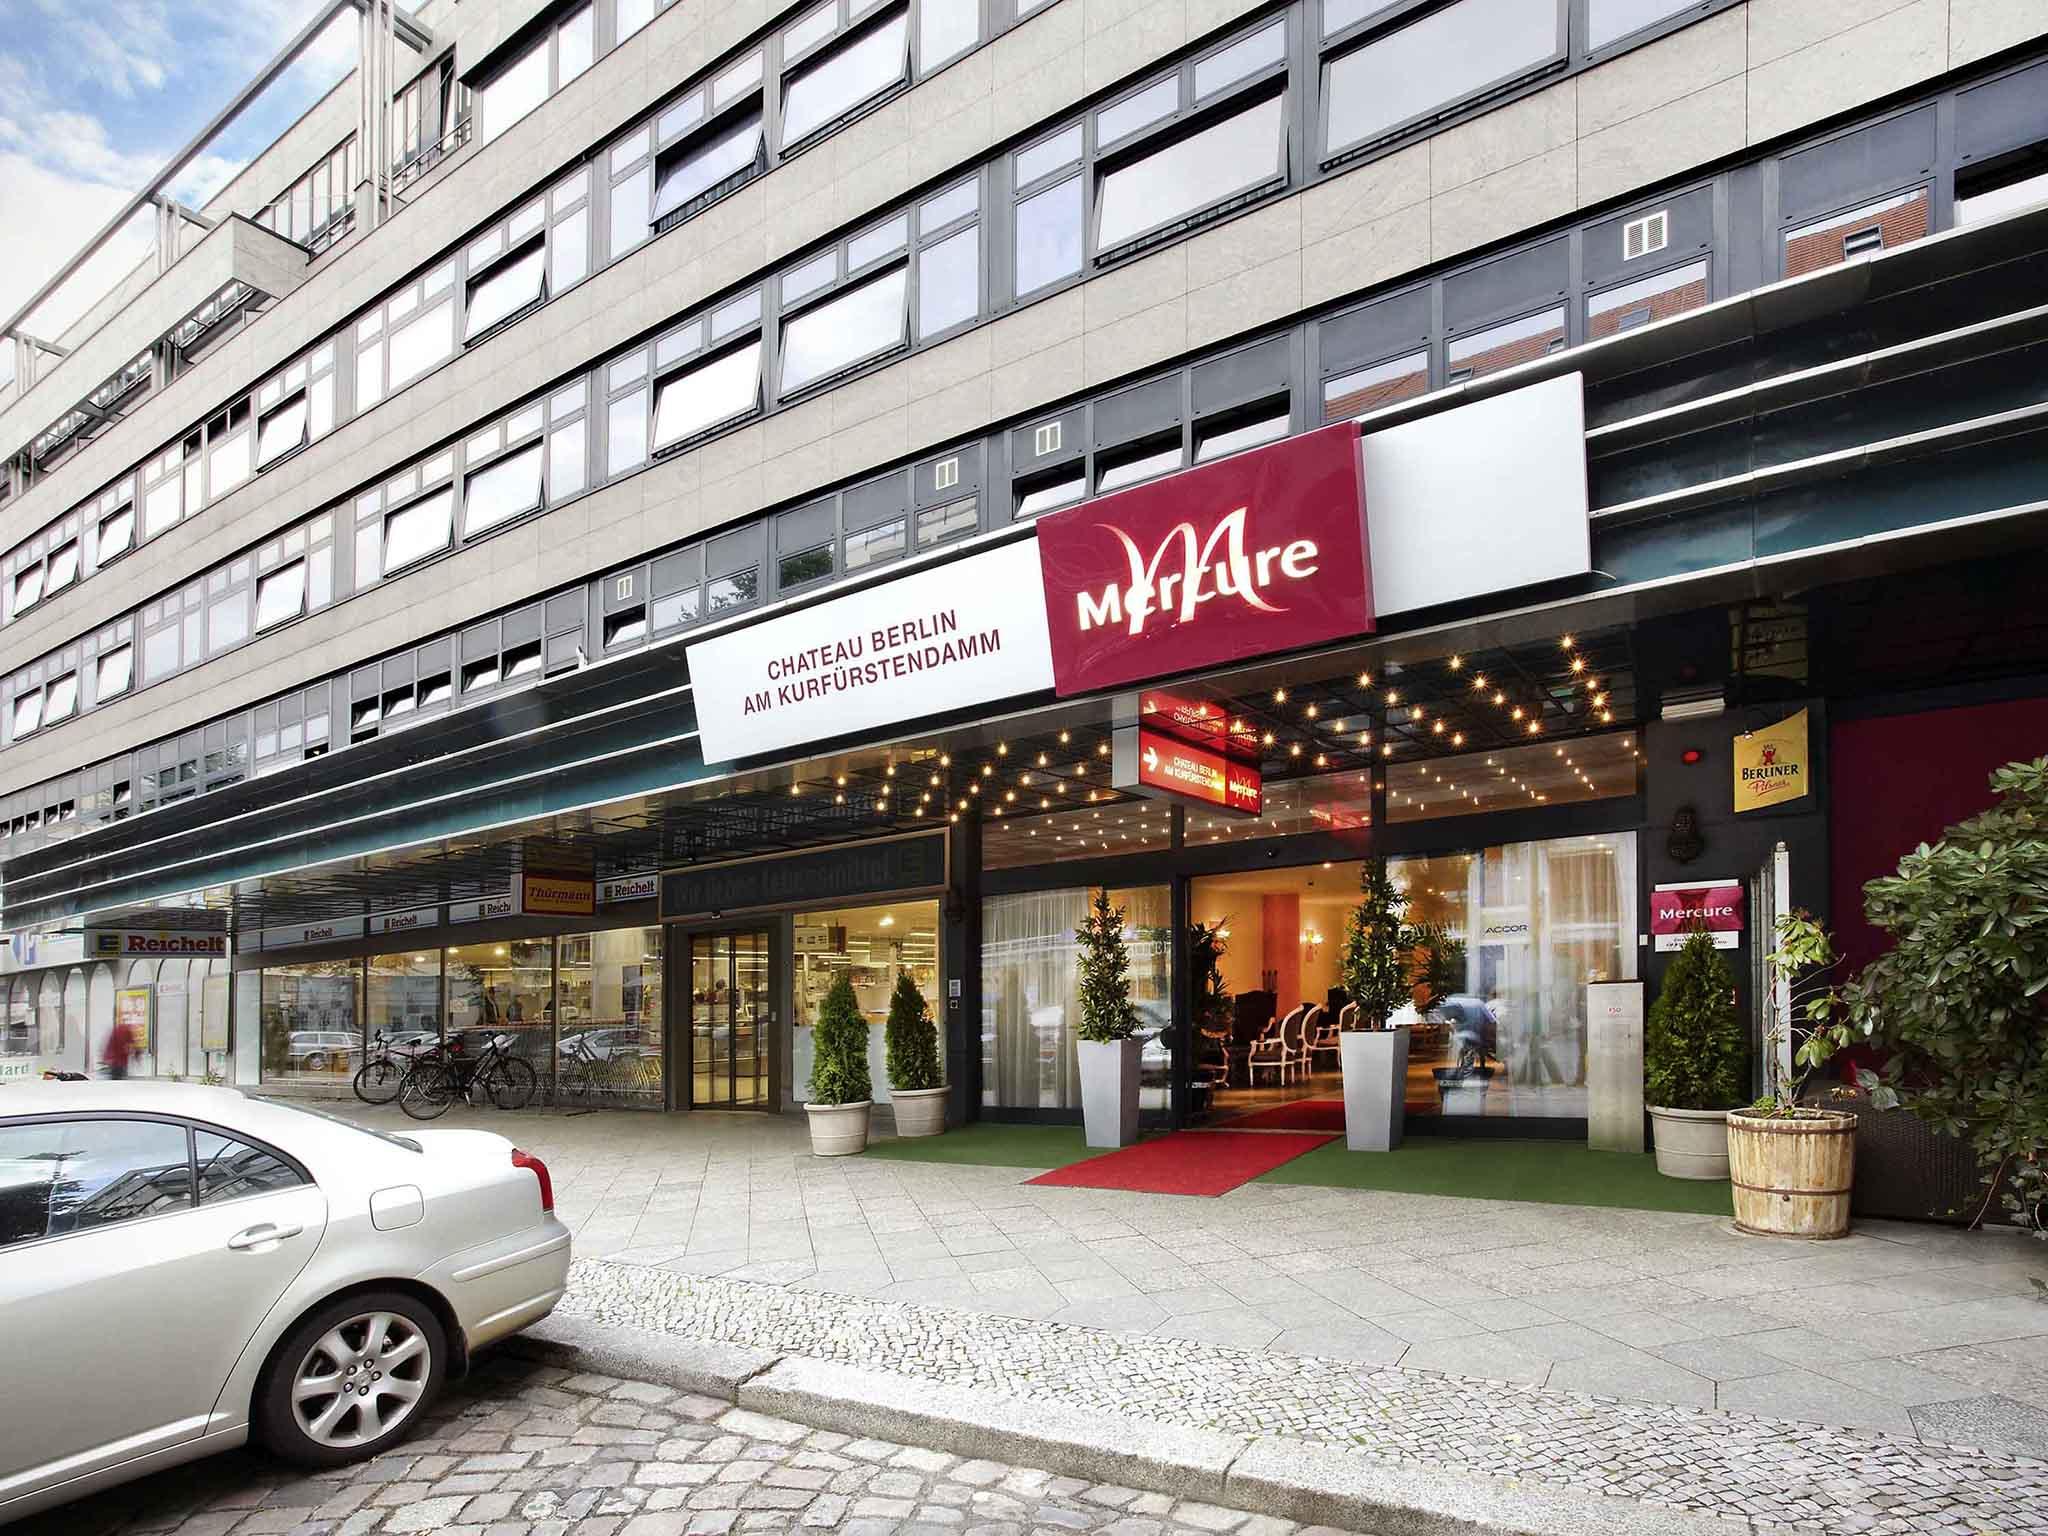 Otel – Mercure Hotel Chateau Berlin am Kurfuerstendamm